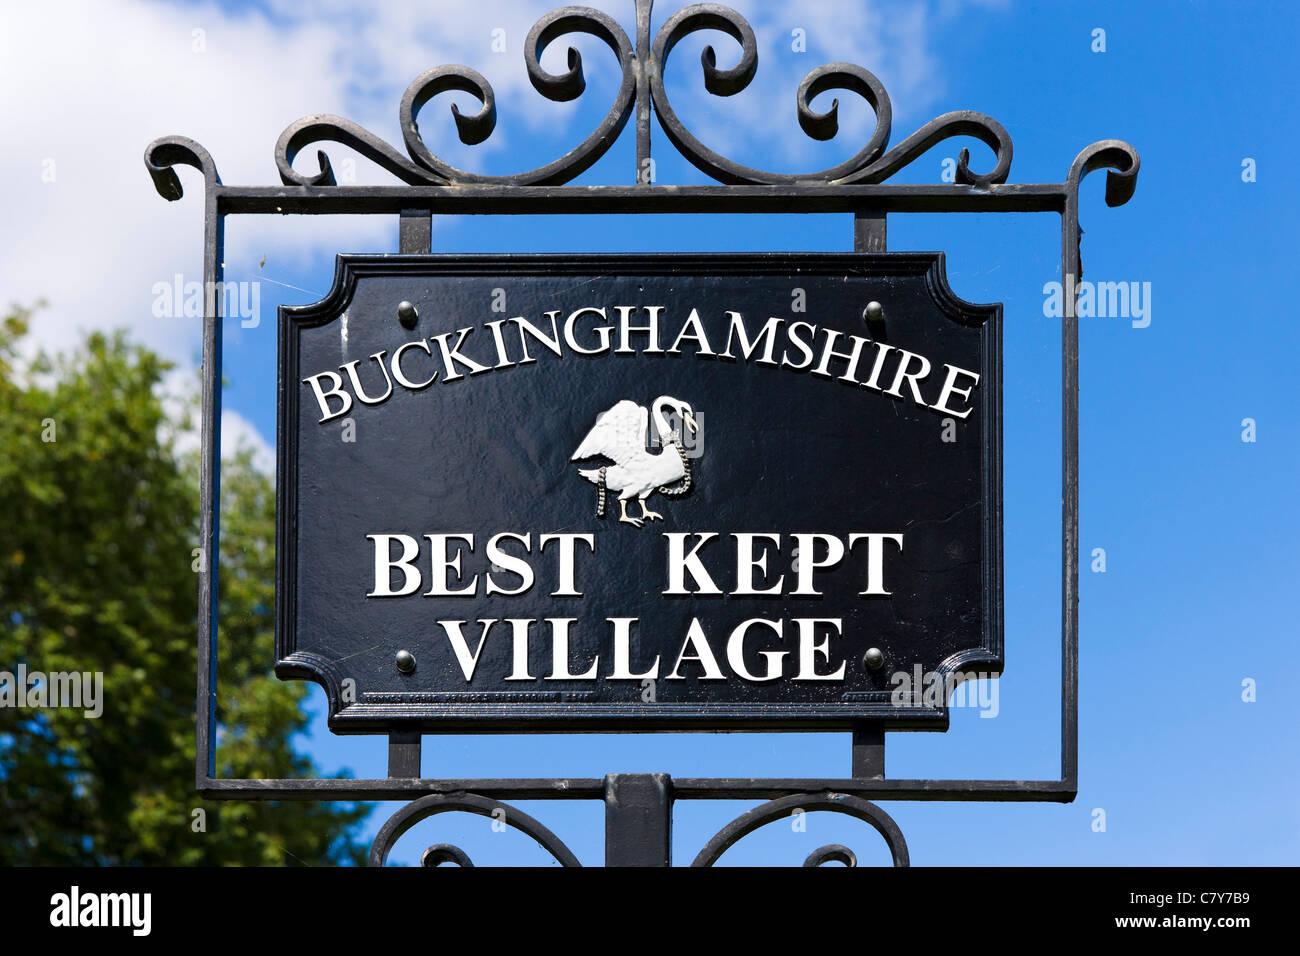 'Buckinghamshire Best Kept Village' sign, High Street, Marlow, Buckinghamshire, England, UK - Stock Image